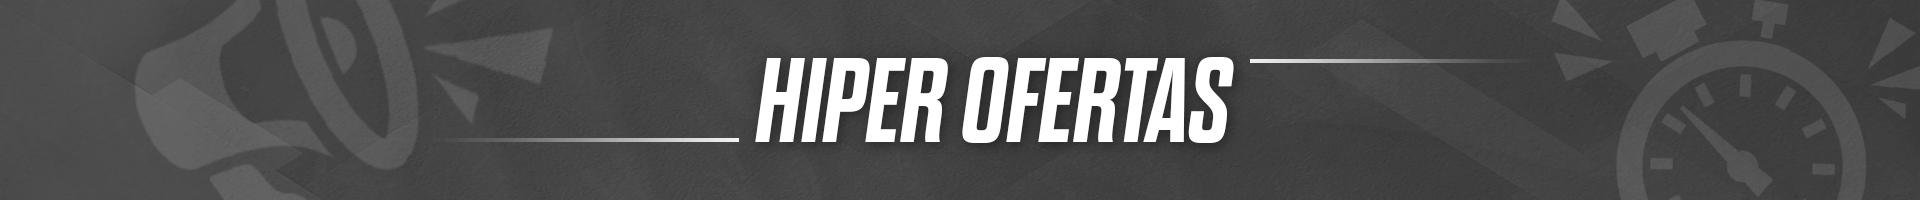 Banner Hiper Ofertas